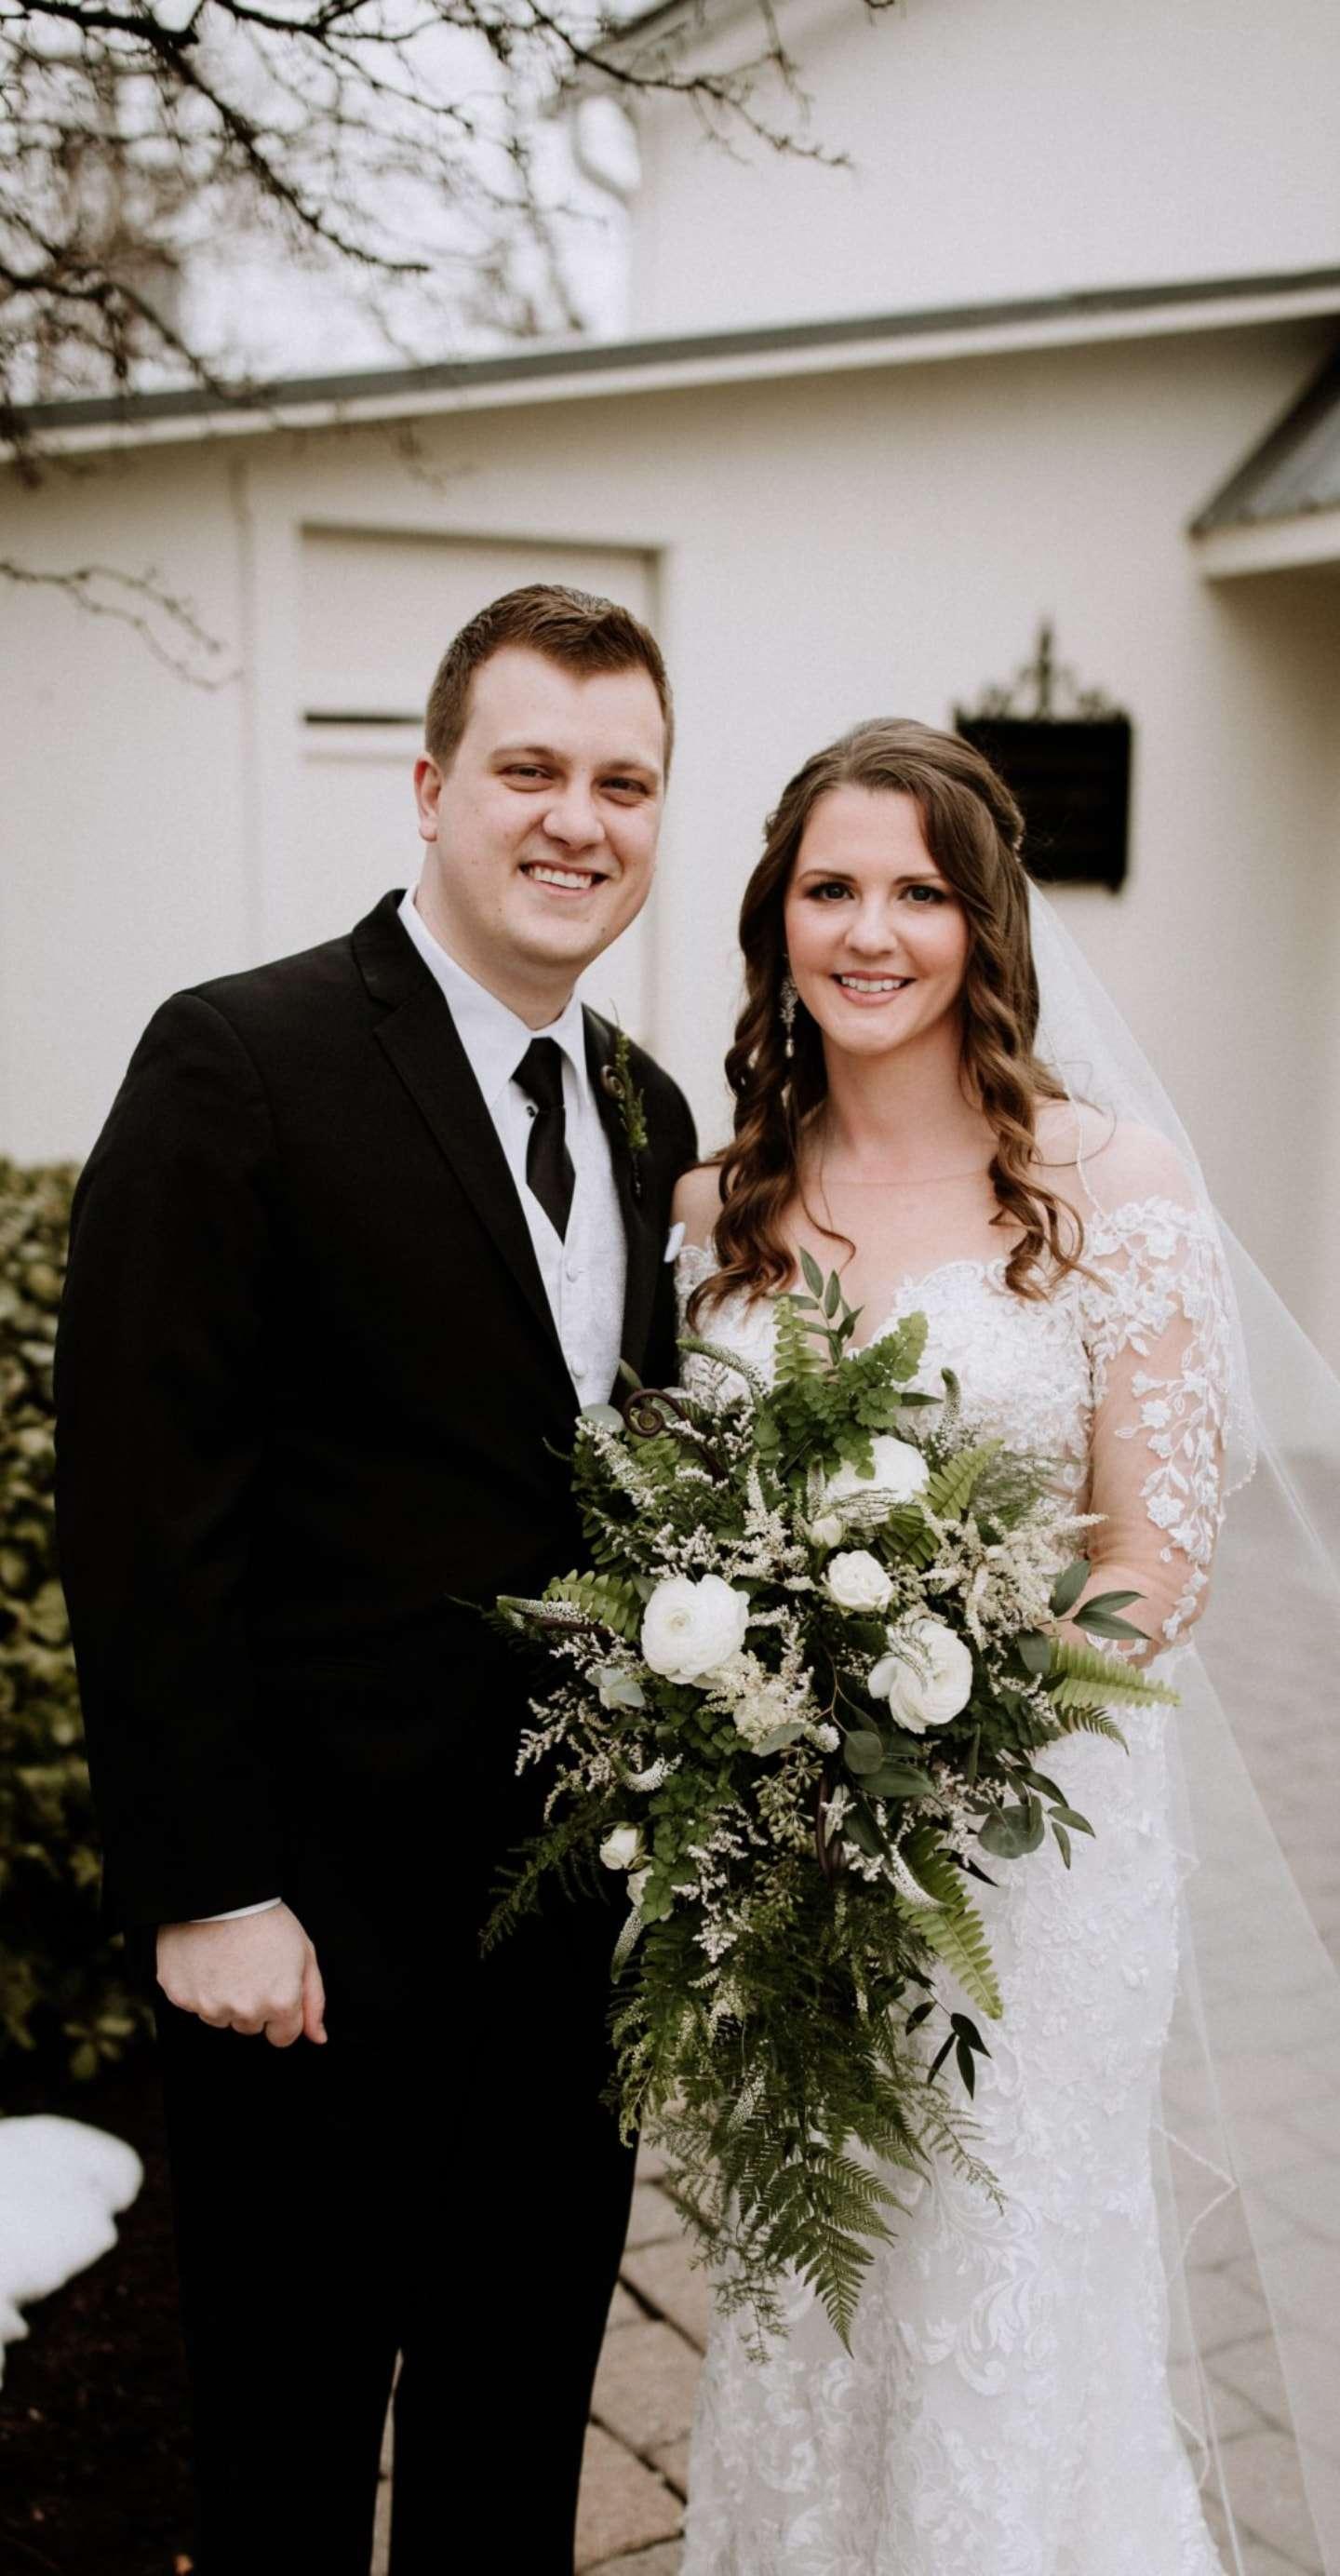 Jenna Visco with her husband